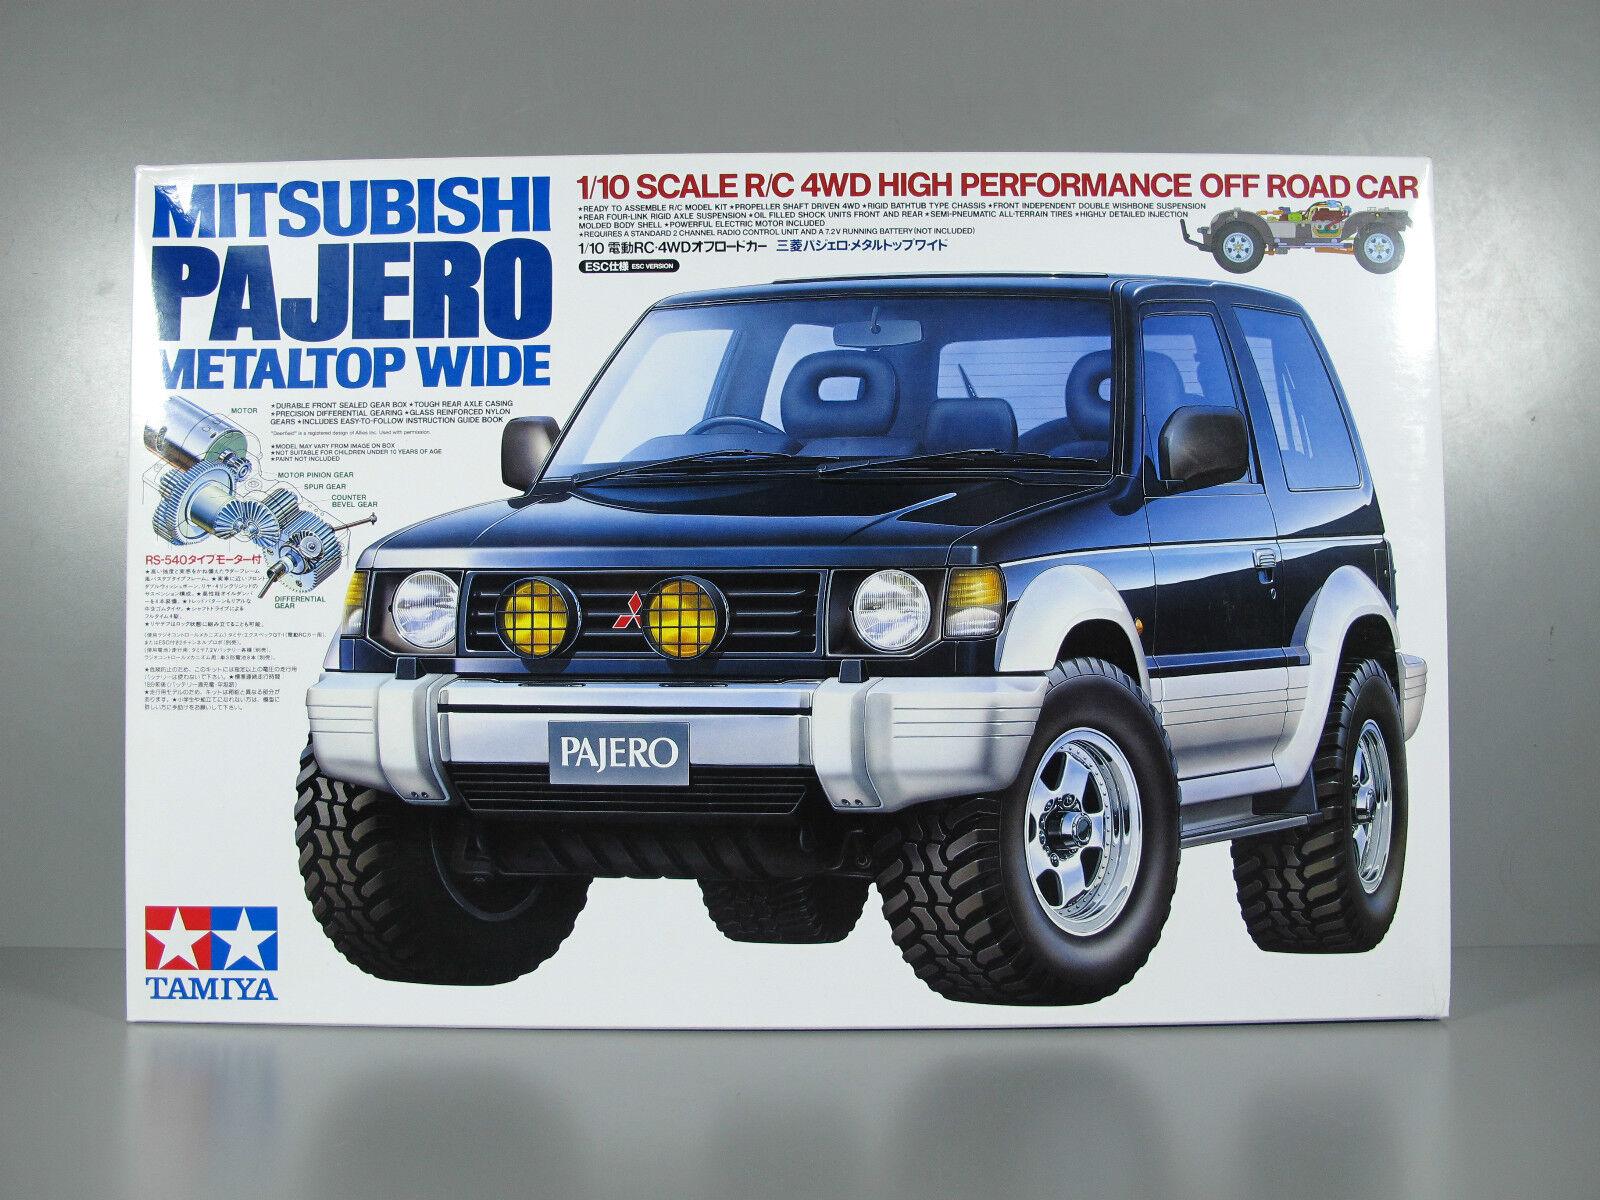 Vintage New in Open Box Tamiya RC 1 10 Mitsubishi Pajero MetalTop Wide 4WD CC-01